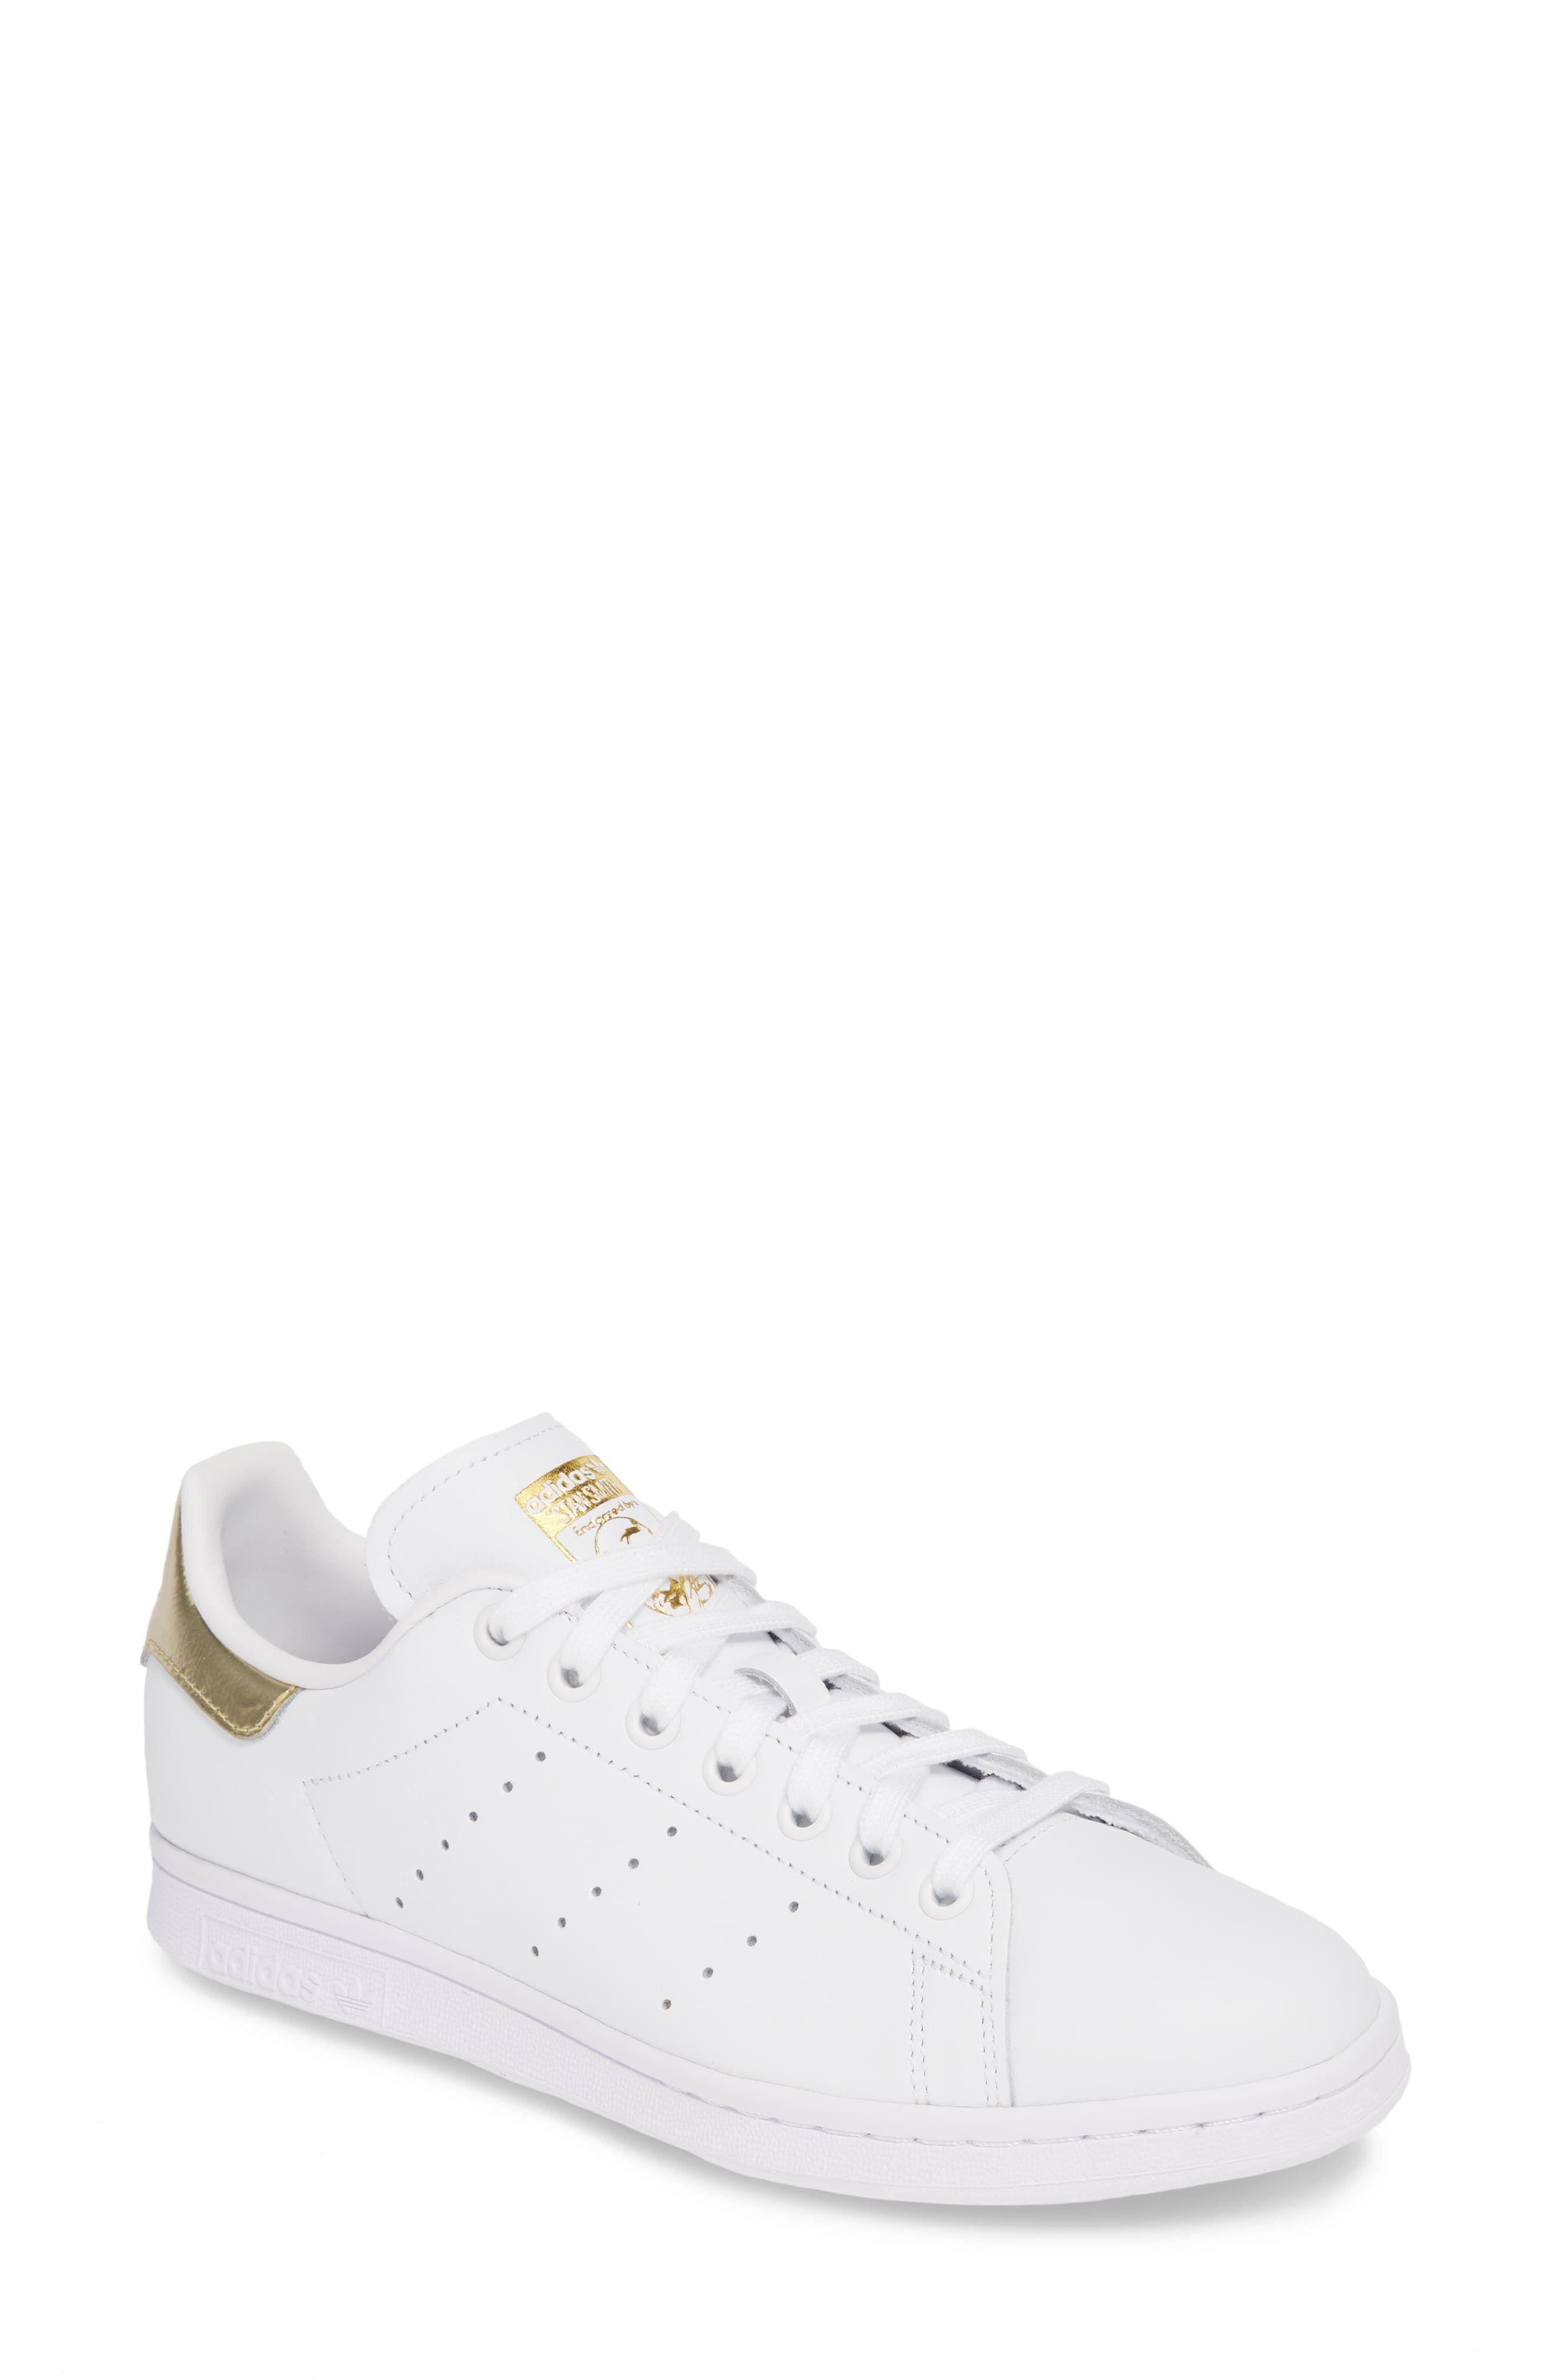 Women's Adidas Stan Smith Sneaker, Size 7.5 Women's 6.5